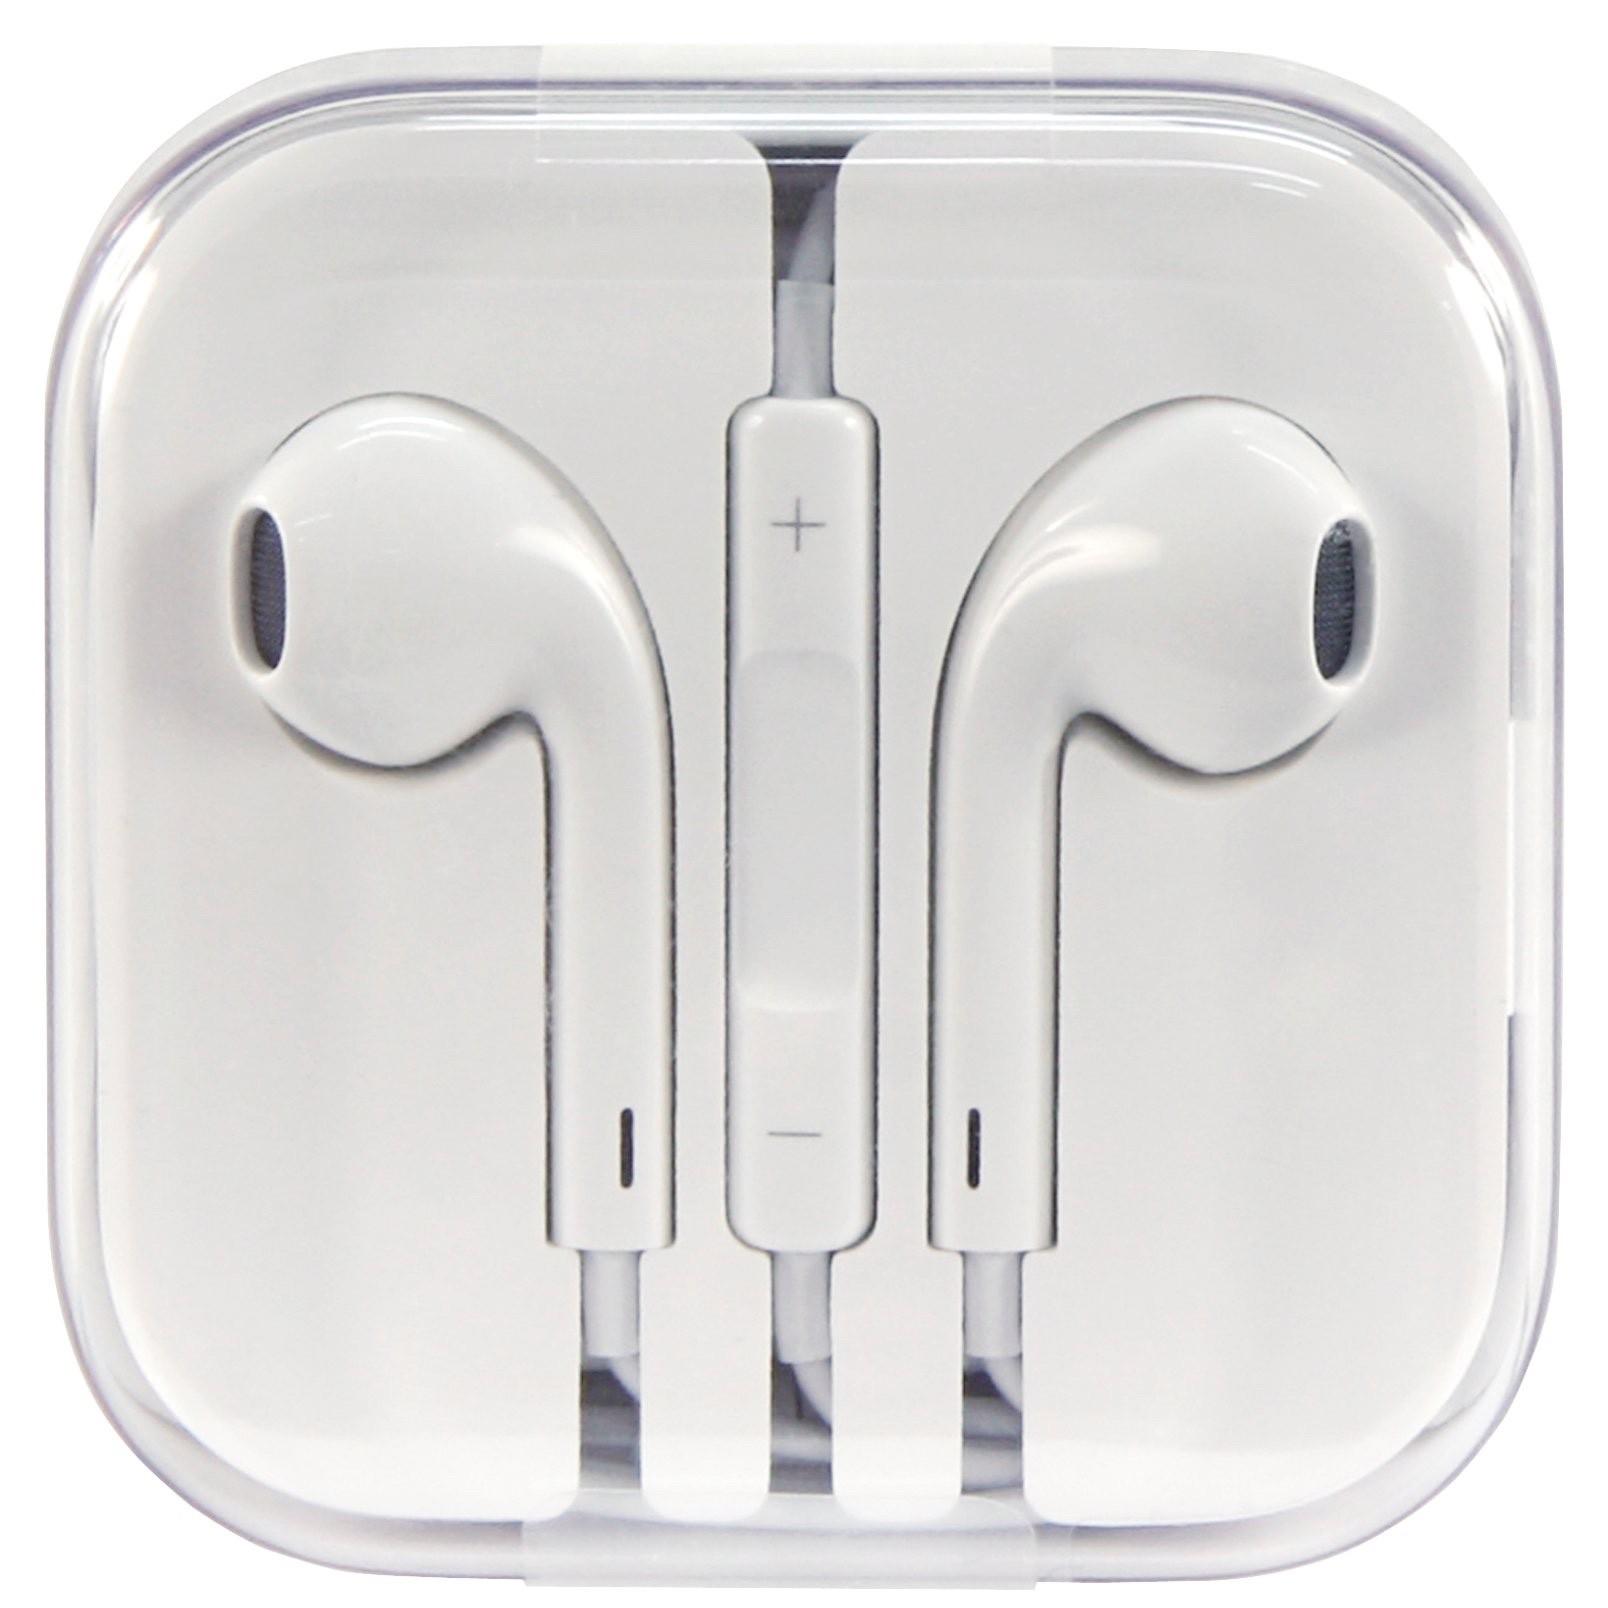 Tai nghe iphone 5,6,6s